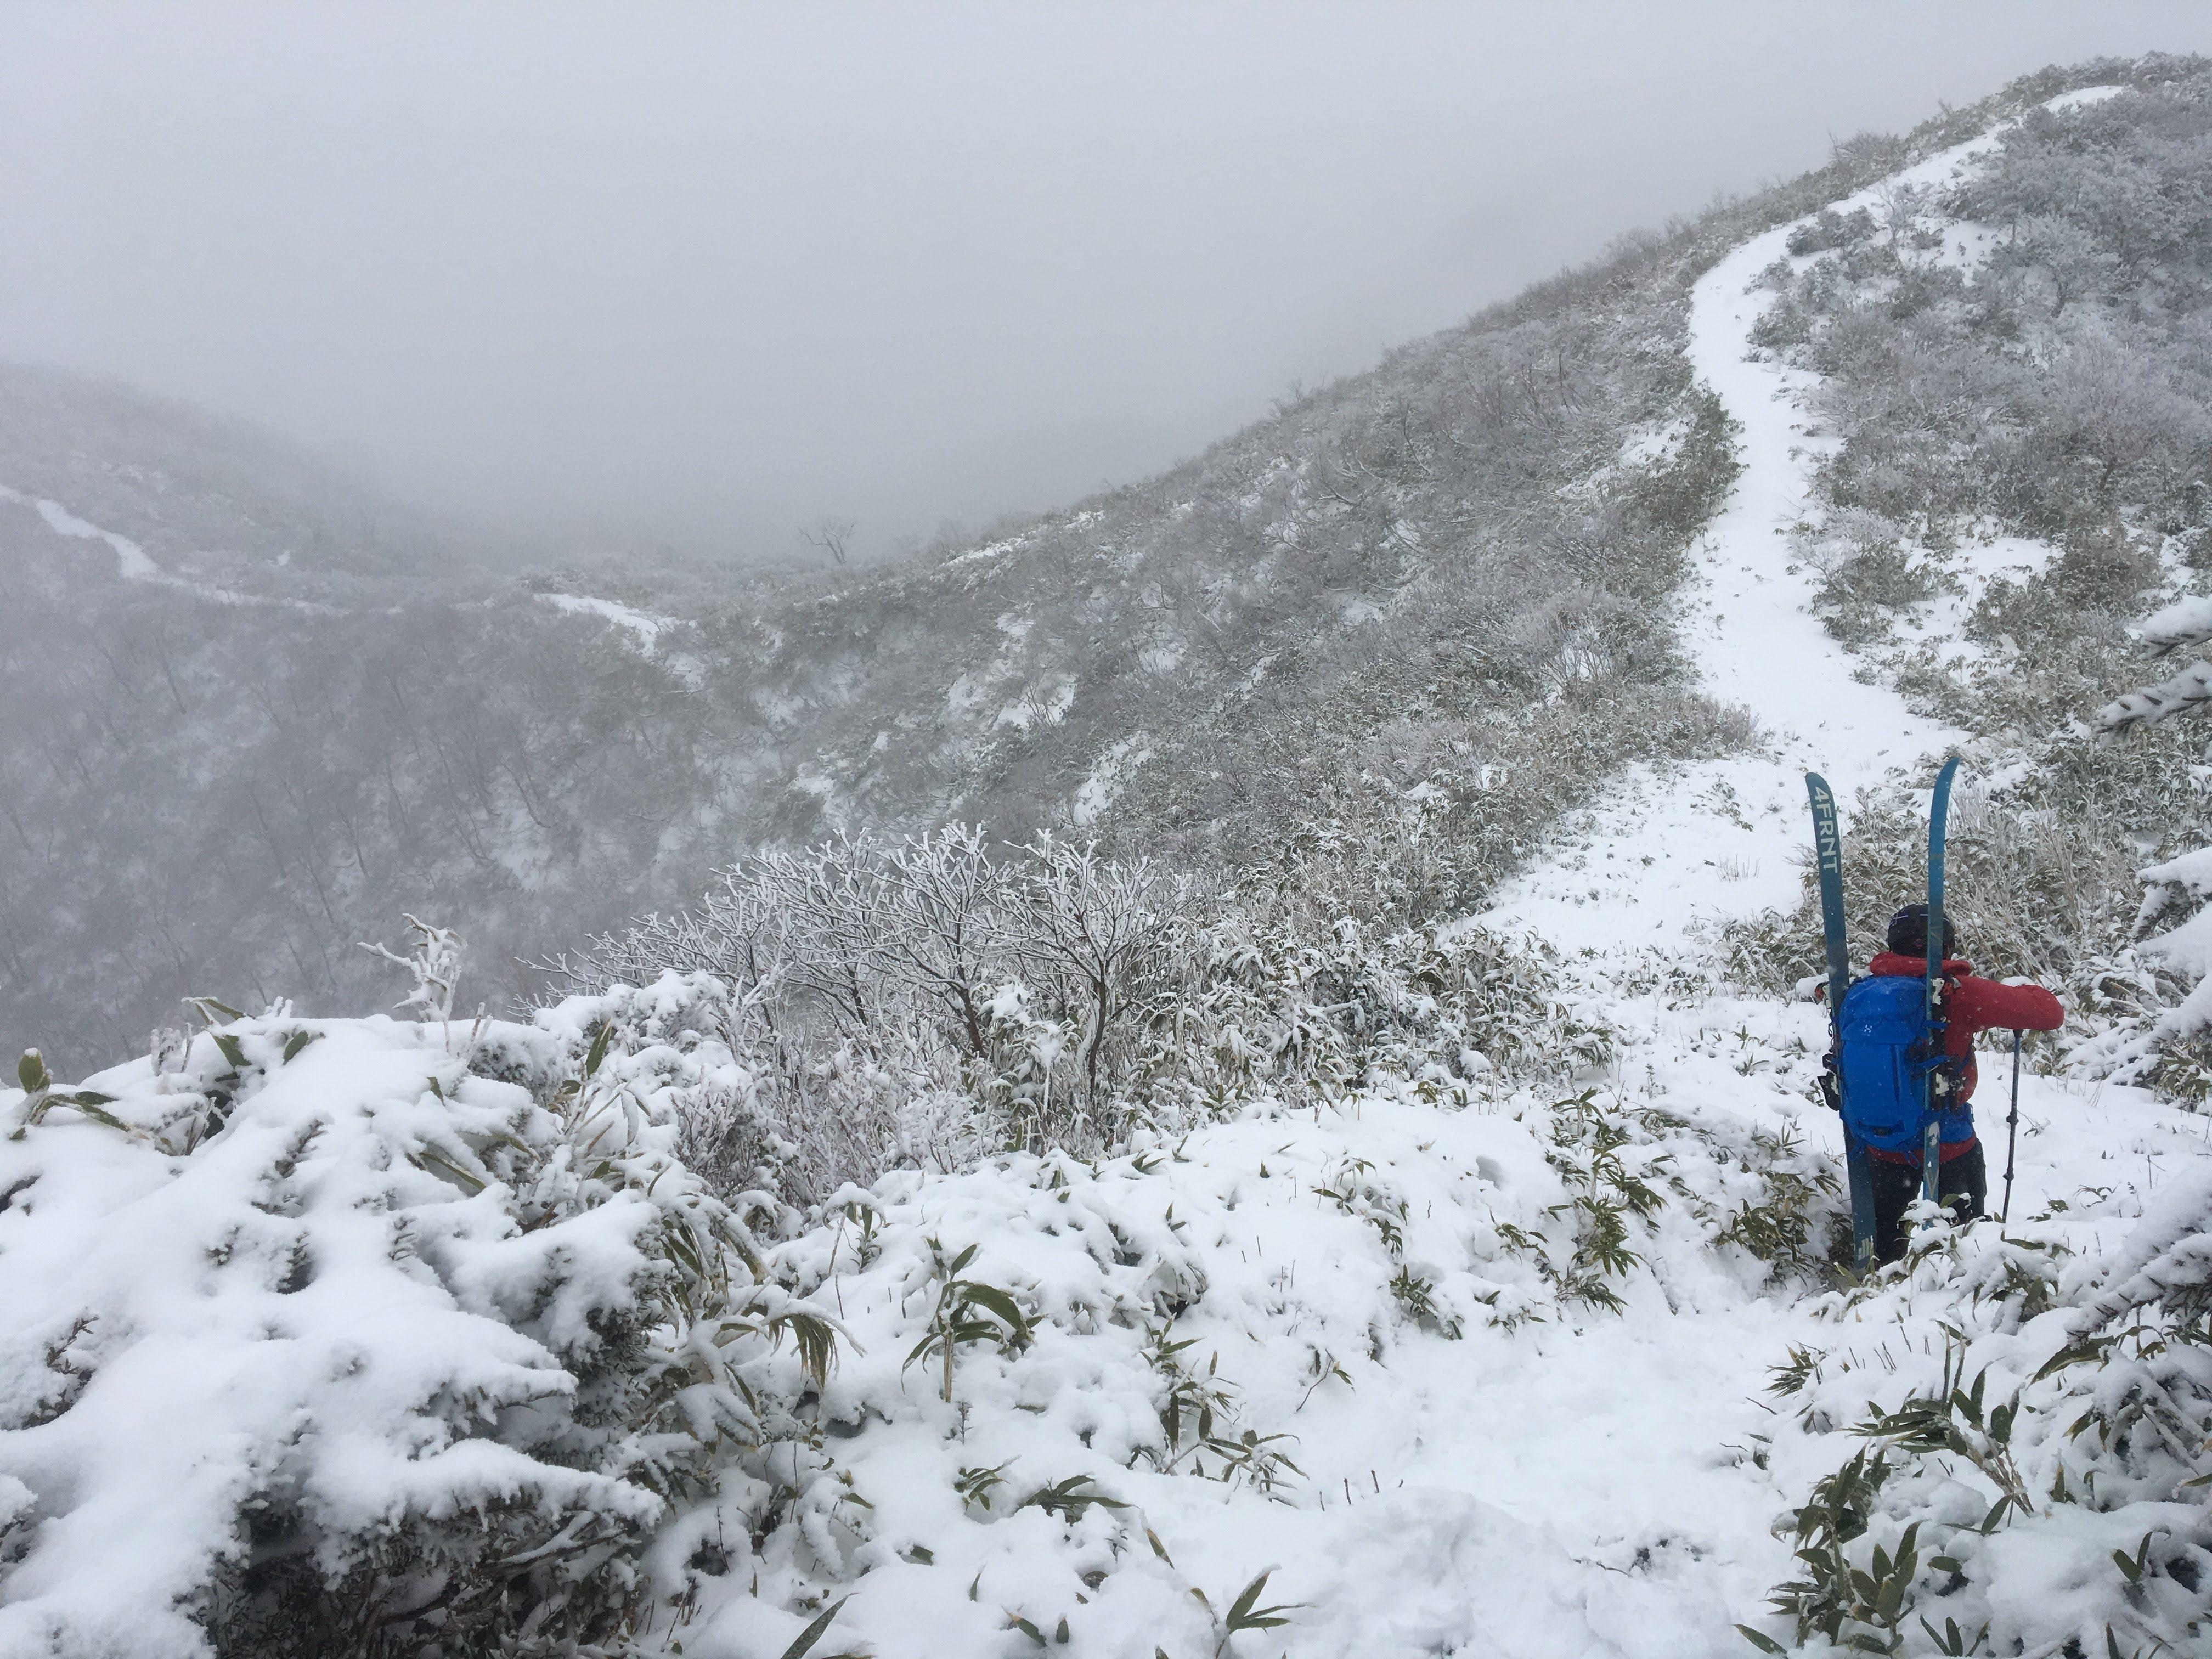 CWP山岳部 大日ヶ岳 BCスキー